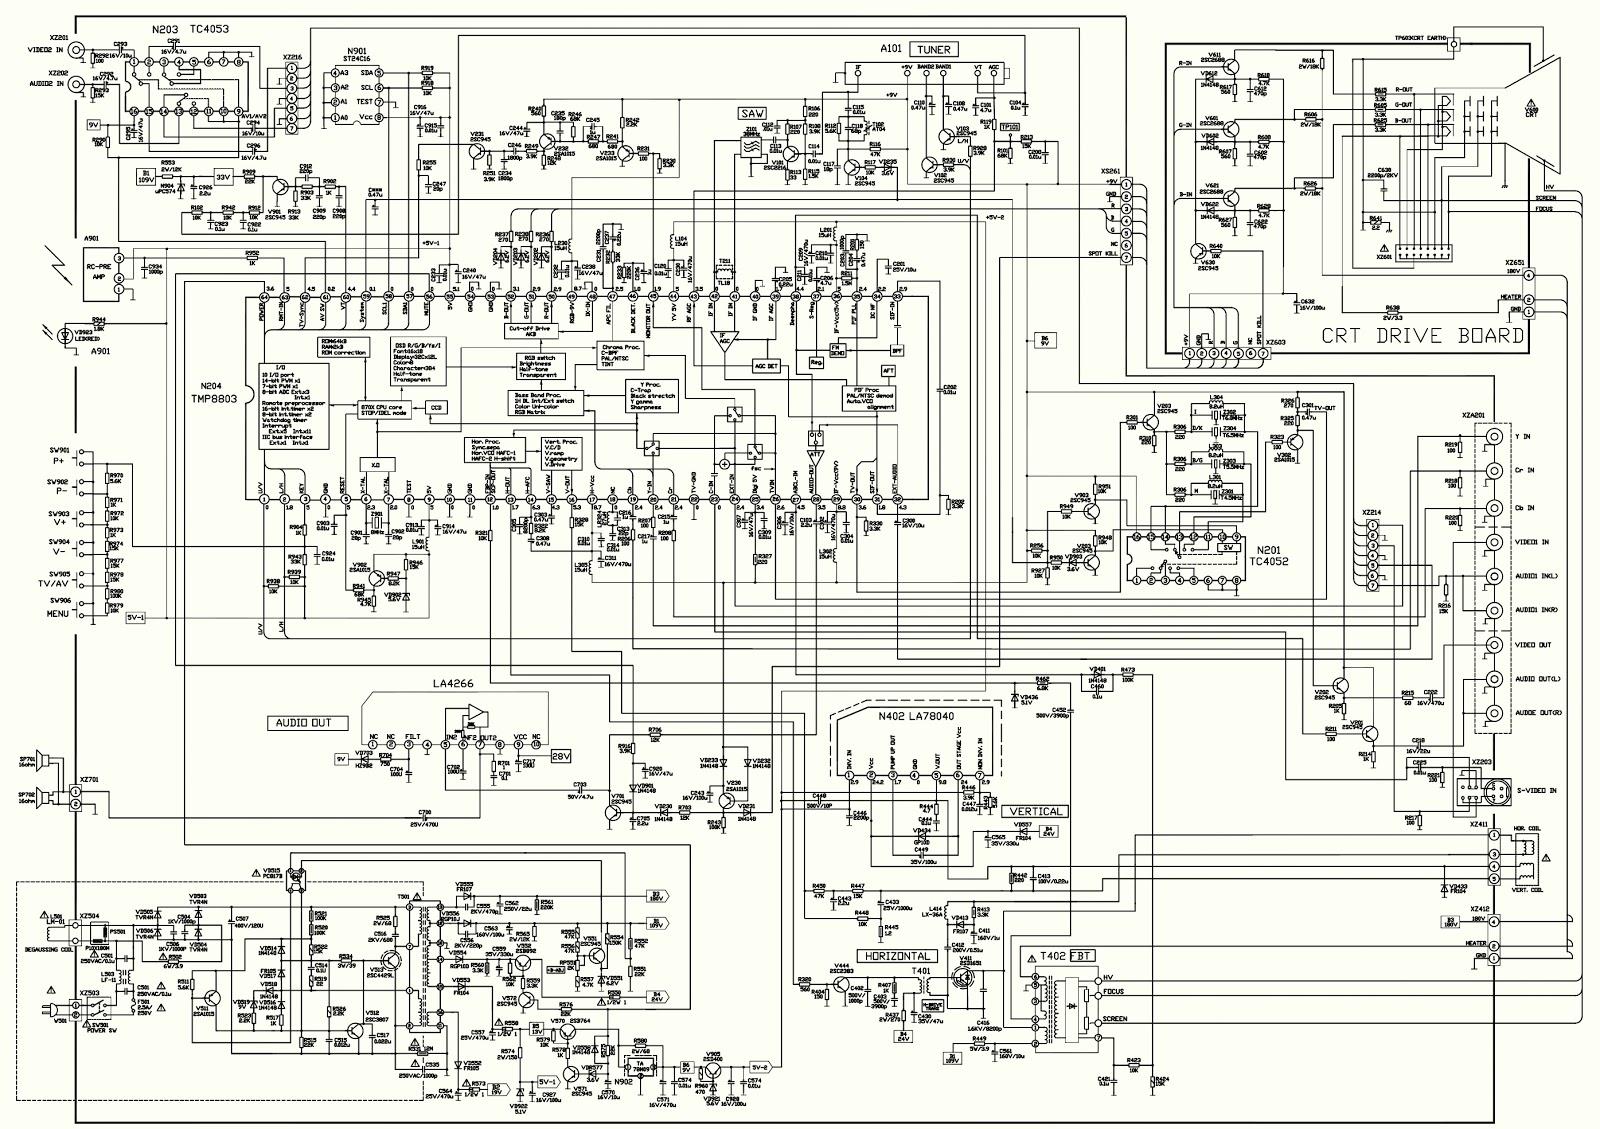 Akira 21fzs1 Crt Tv Troubleshooting Circuit Diagram